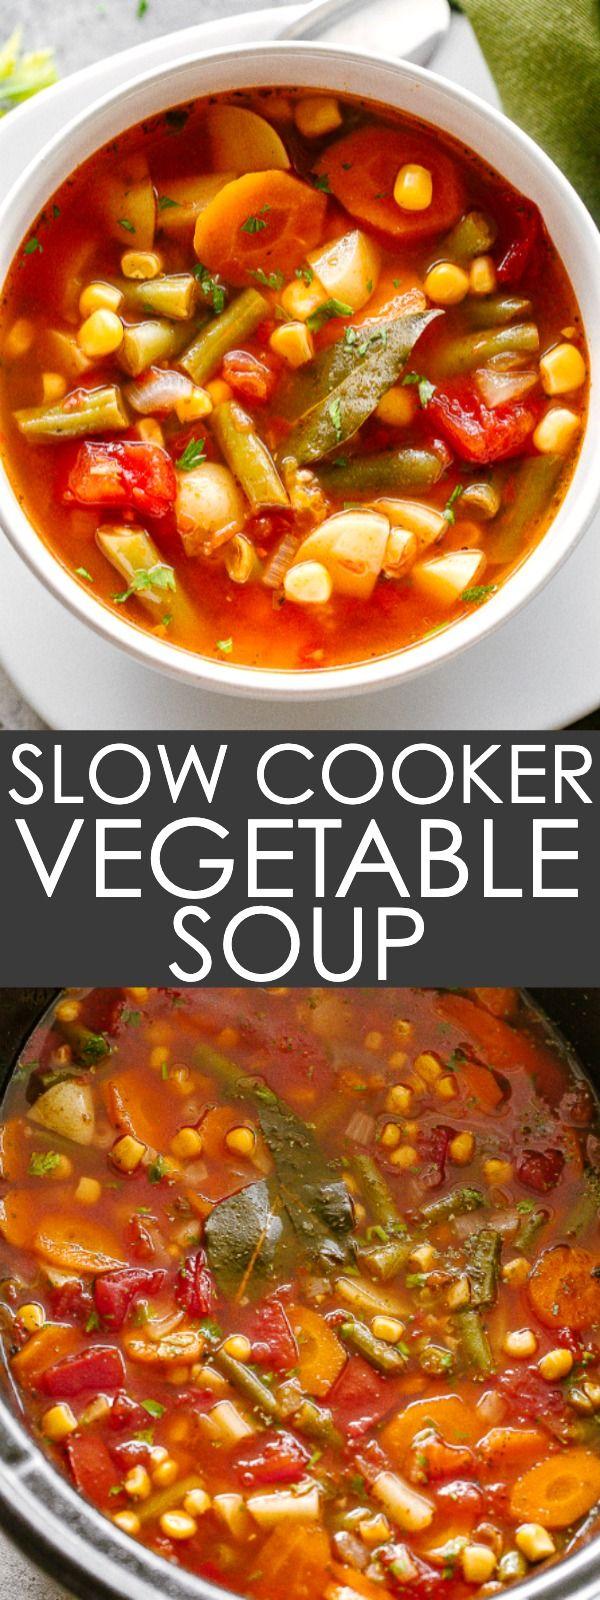 Slow Cooker Vegetable Soup Loaded With Fresh Vegetables